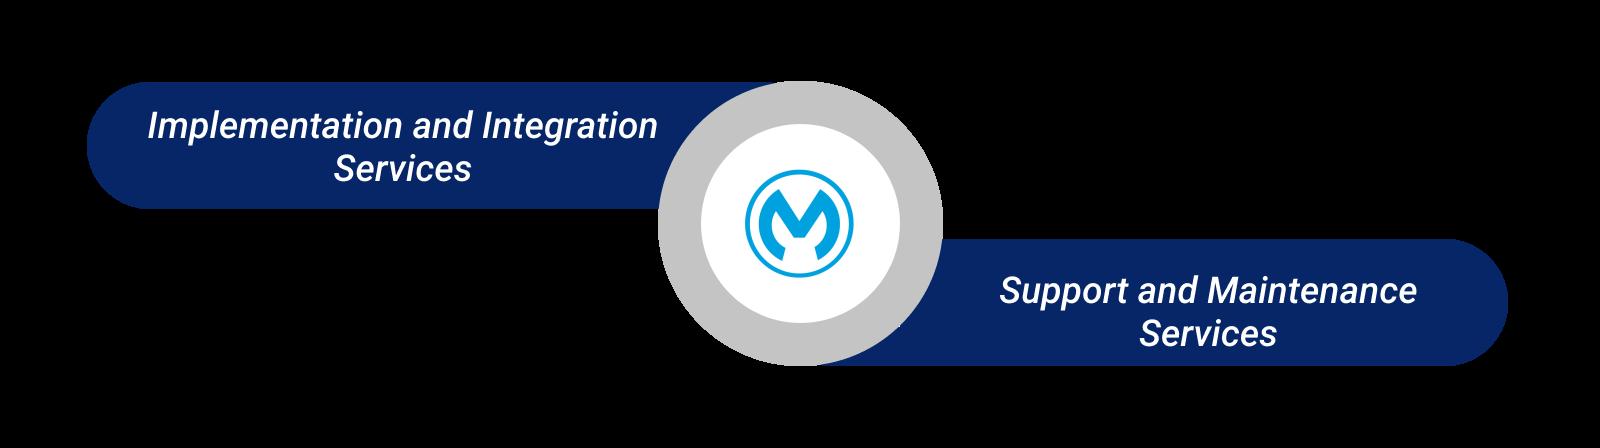 Mulesoft capabilities